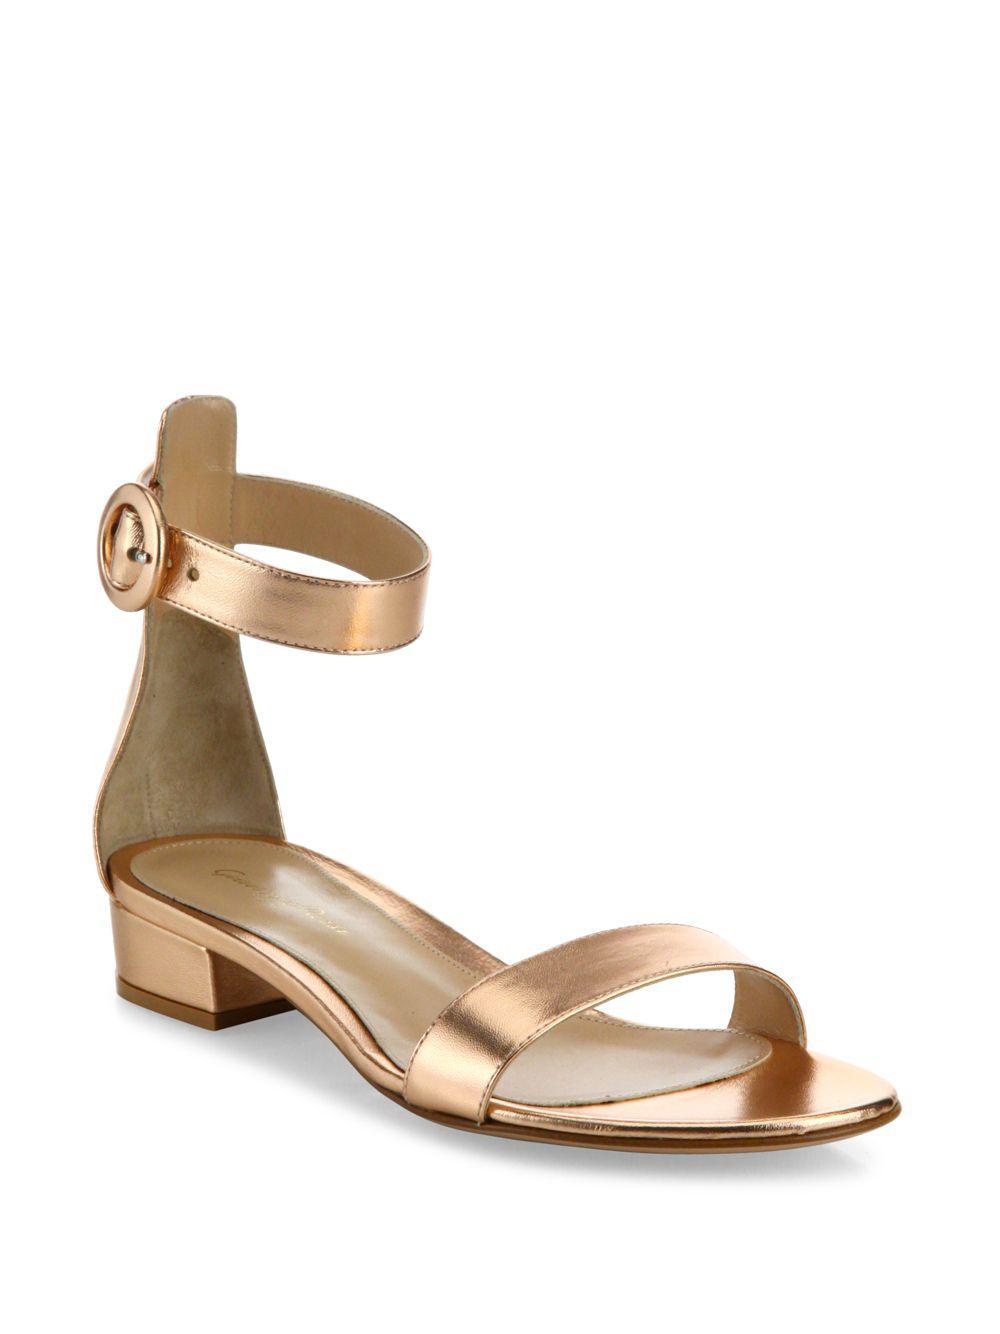 aafbc63bd8d Lyst - Gianvito Rossi Metallic Leather Ankle-strap Sandals in Metallic